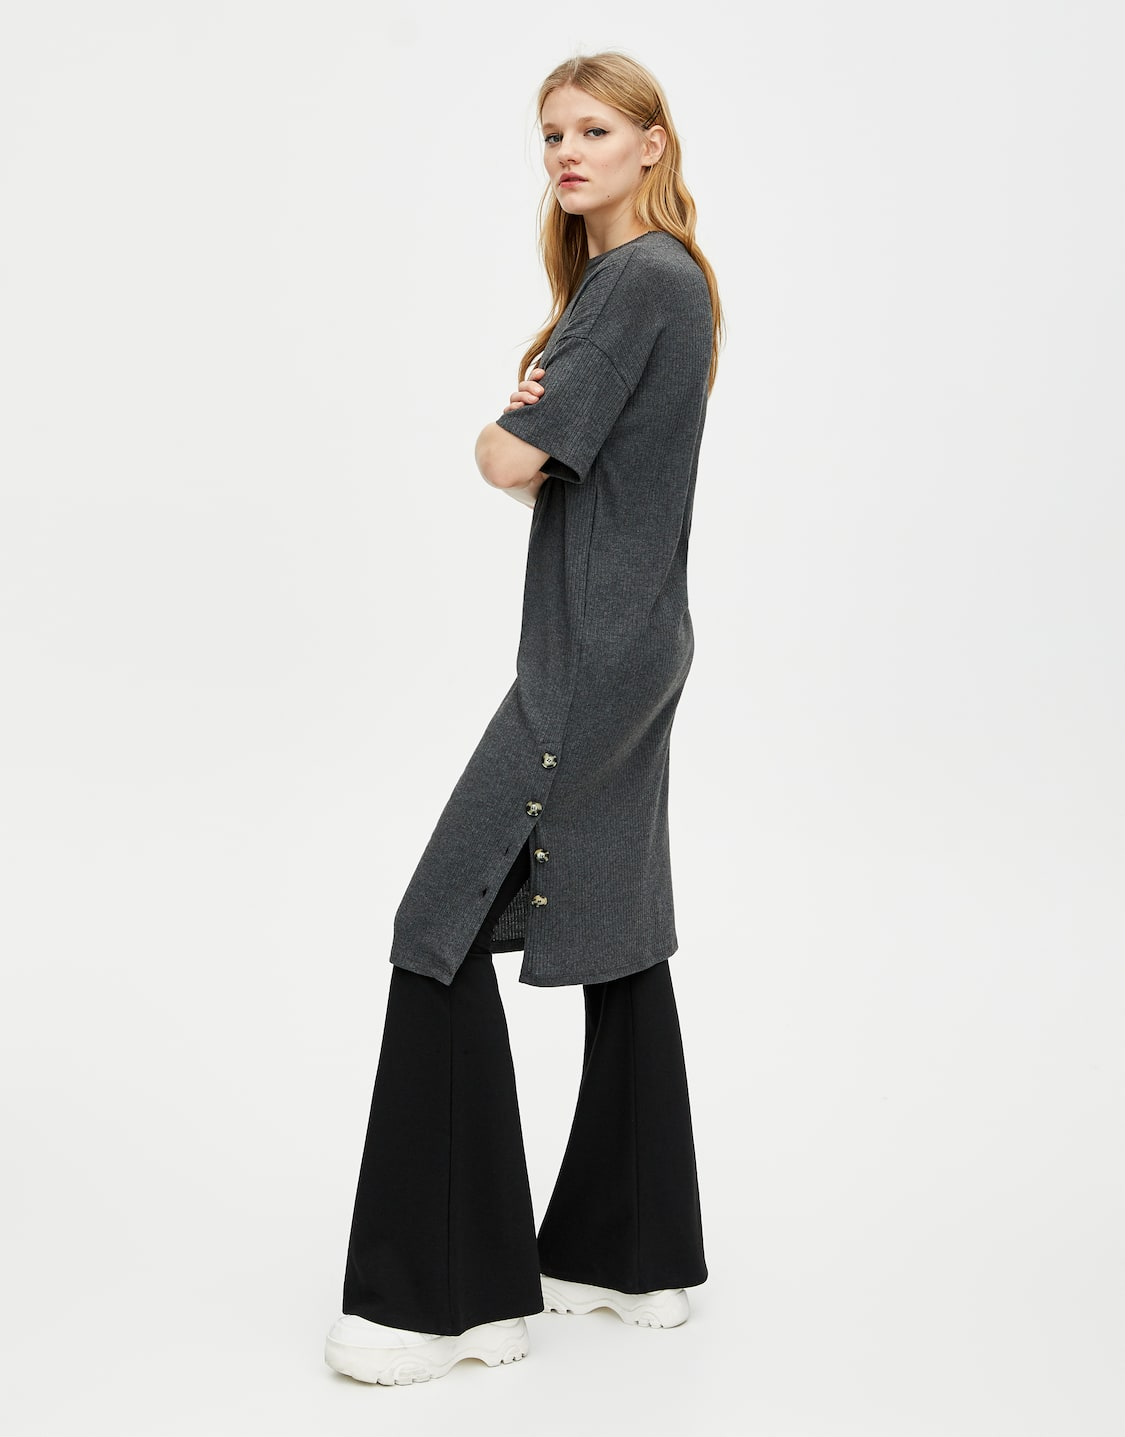 5fae5c1ad70 Μίντι φόρεμα με ύφανση ριπ και κουμπιά. Κωδικός προϊόντος 9393237